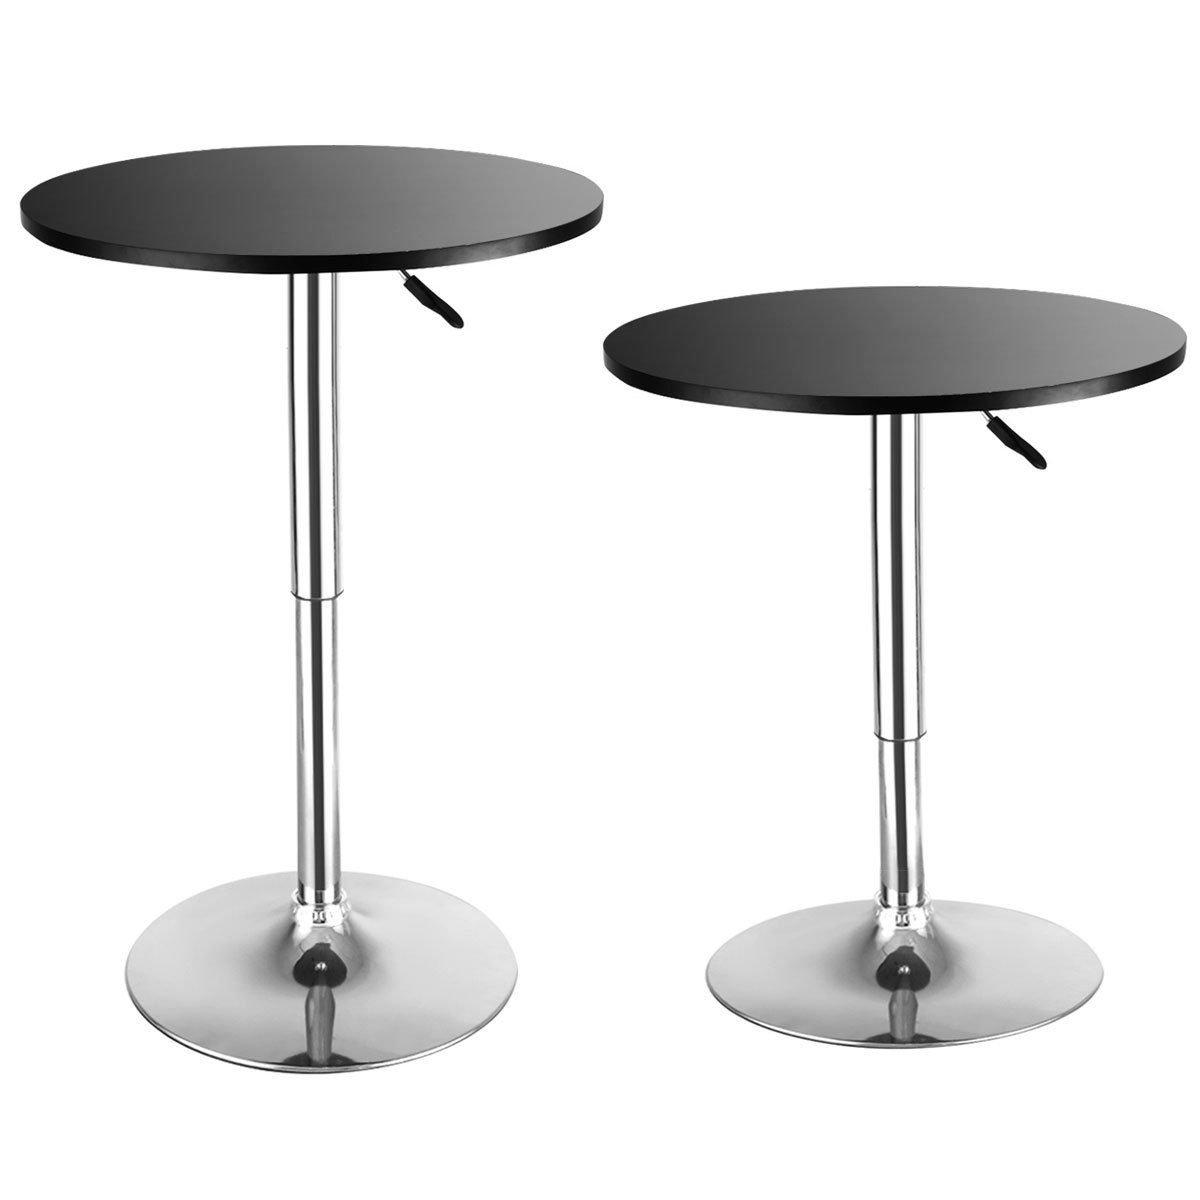 COSTWAY Modern Round Bar Table Adjustable Bistro Pub Counter Wood Top Swivel Indoor (2)